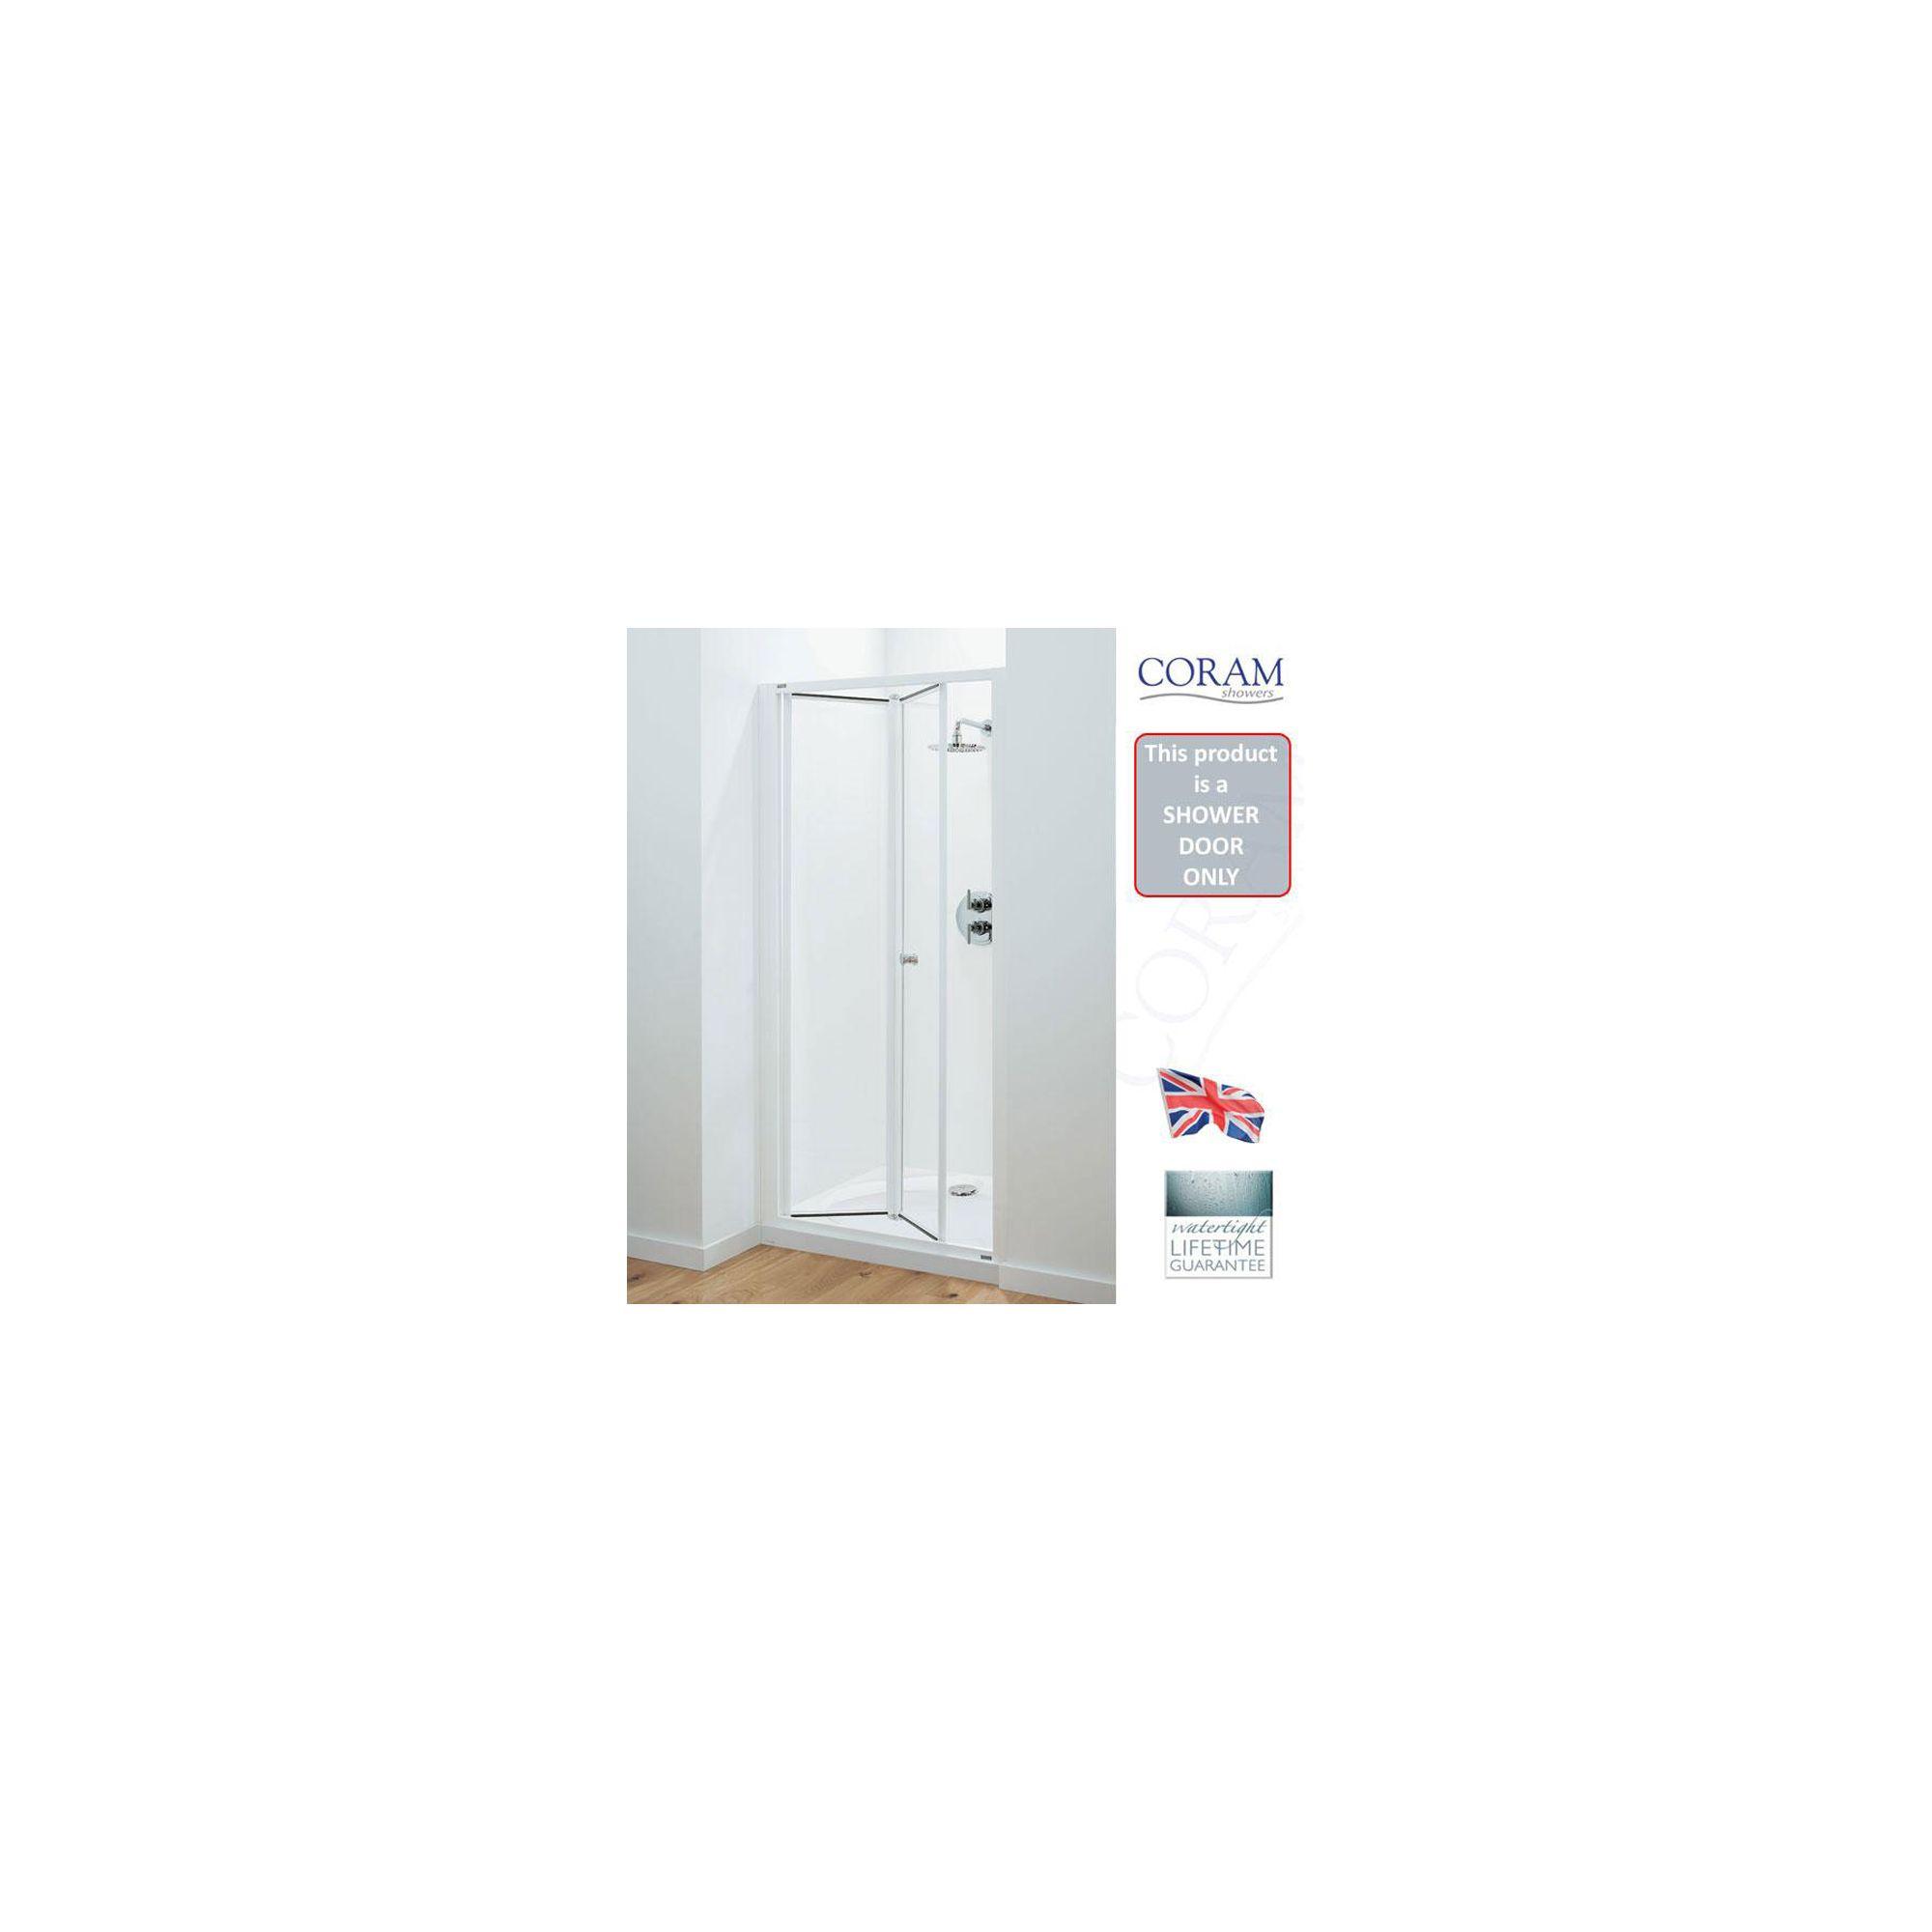 Coram Optima Bi-Fold Shower Door, 700mm Wide, Chrome Frame, 6mm Plain Glass at Tesco Direct